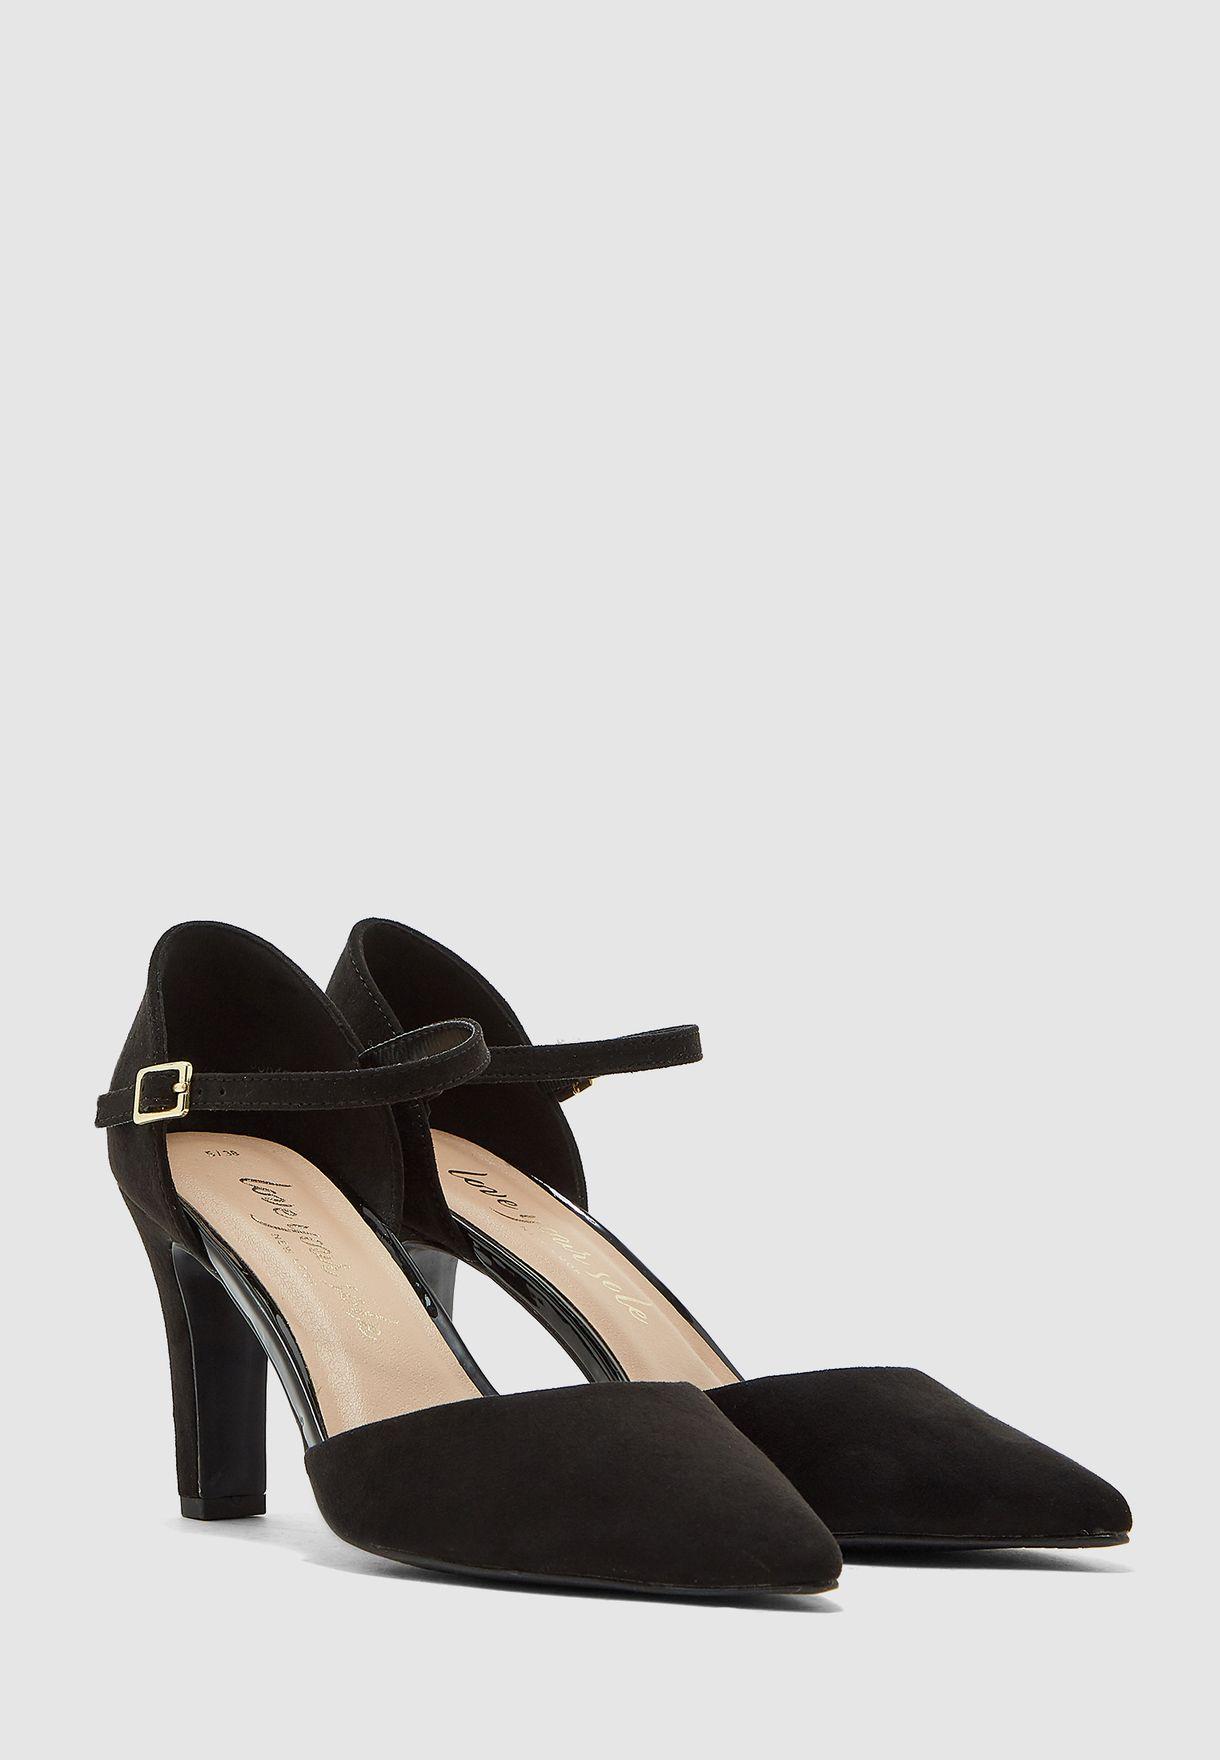 Buckle Detail Ankle Strap Pump - Black